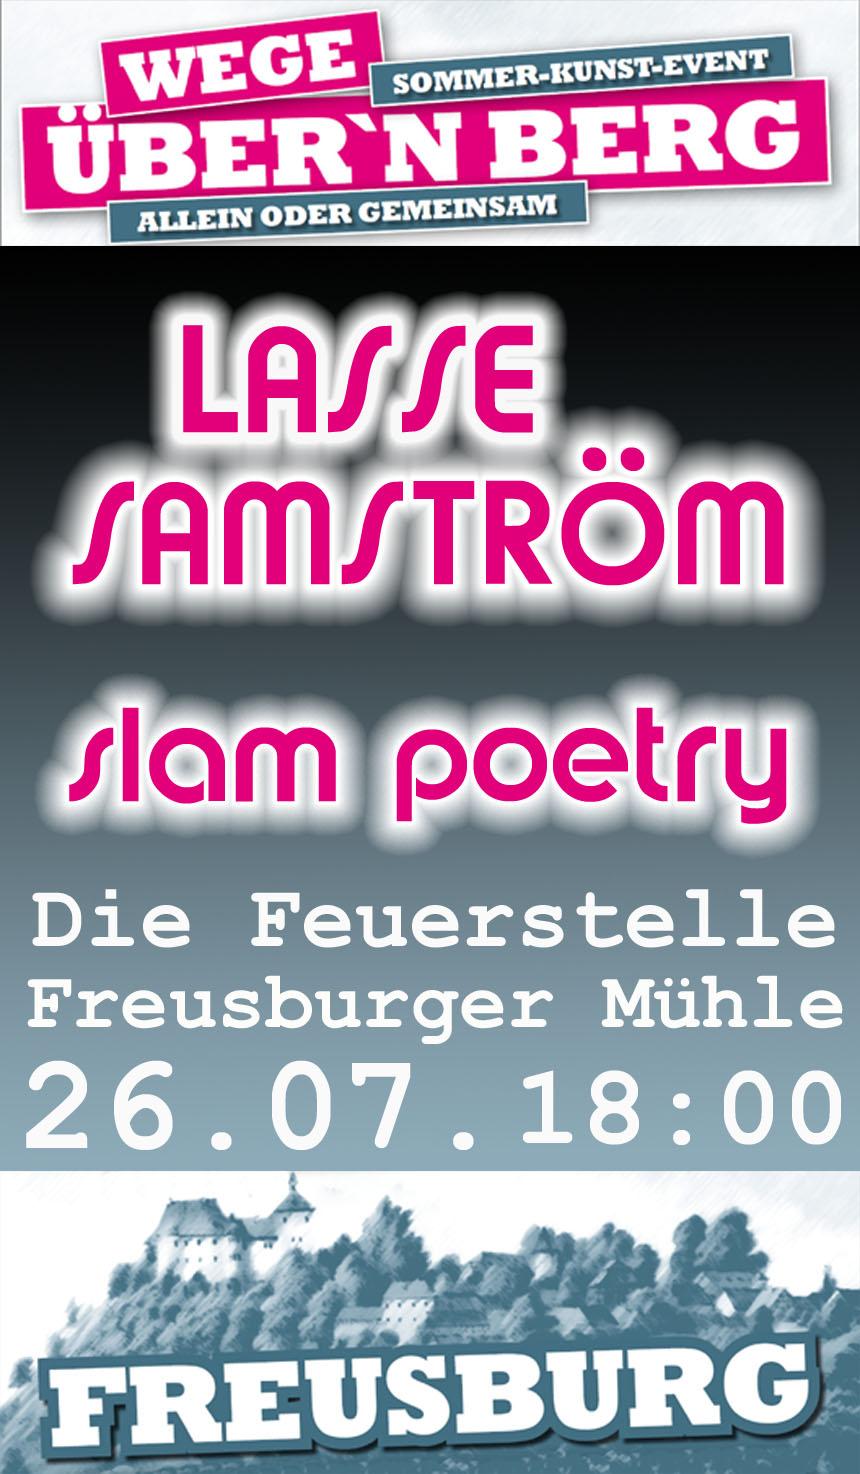 26.07.2015 Freusburger Mühle, Die Feuerstelle: Lasse Samström